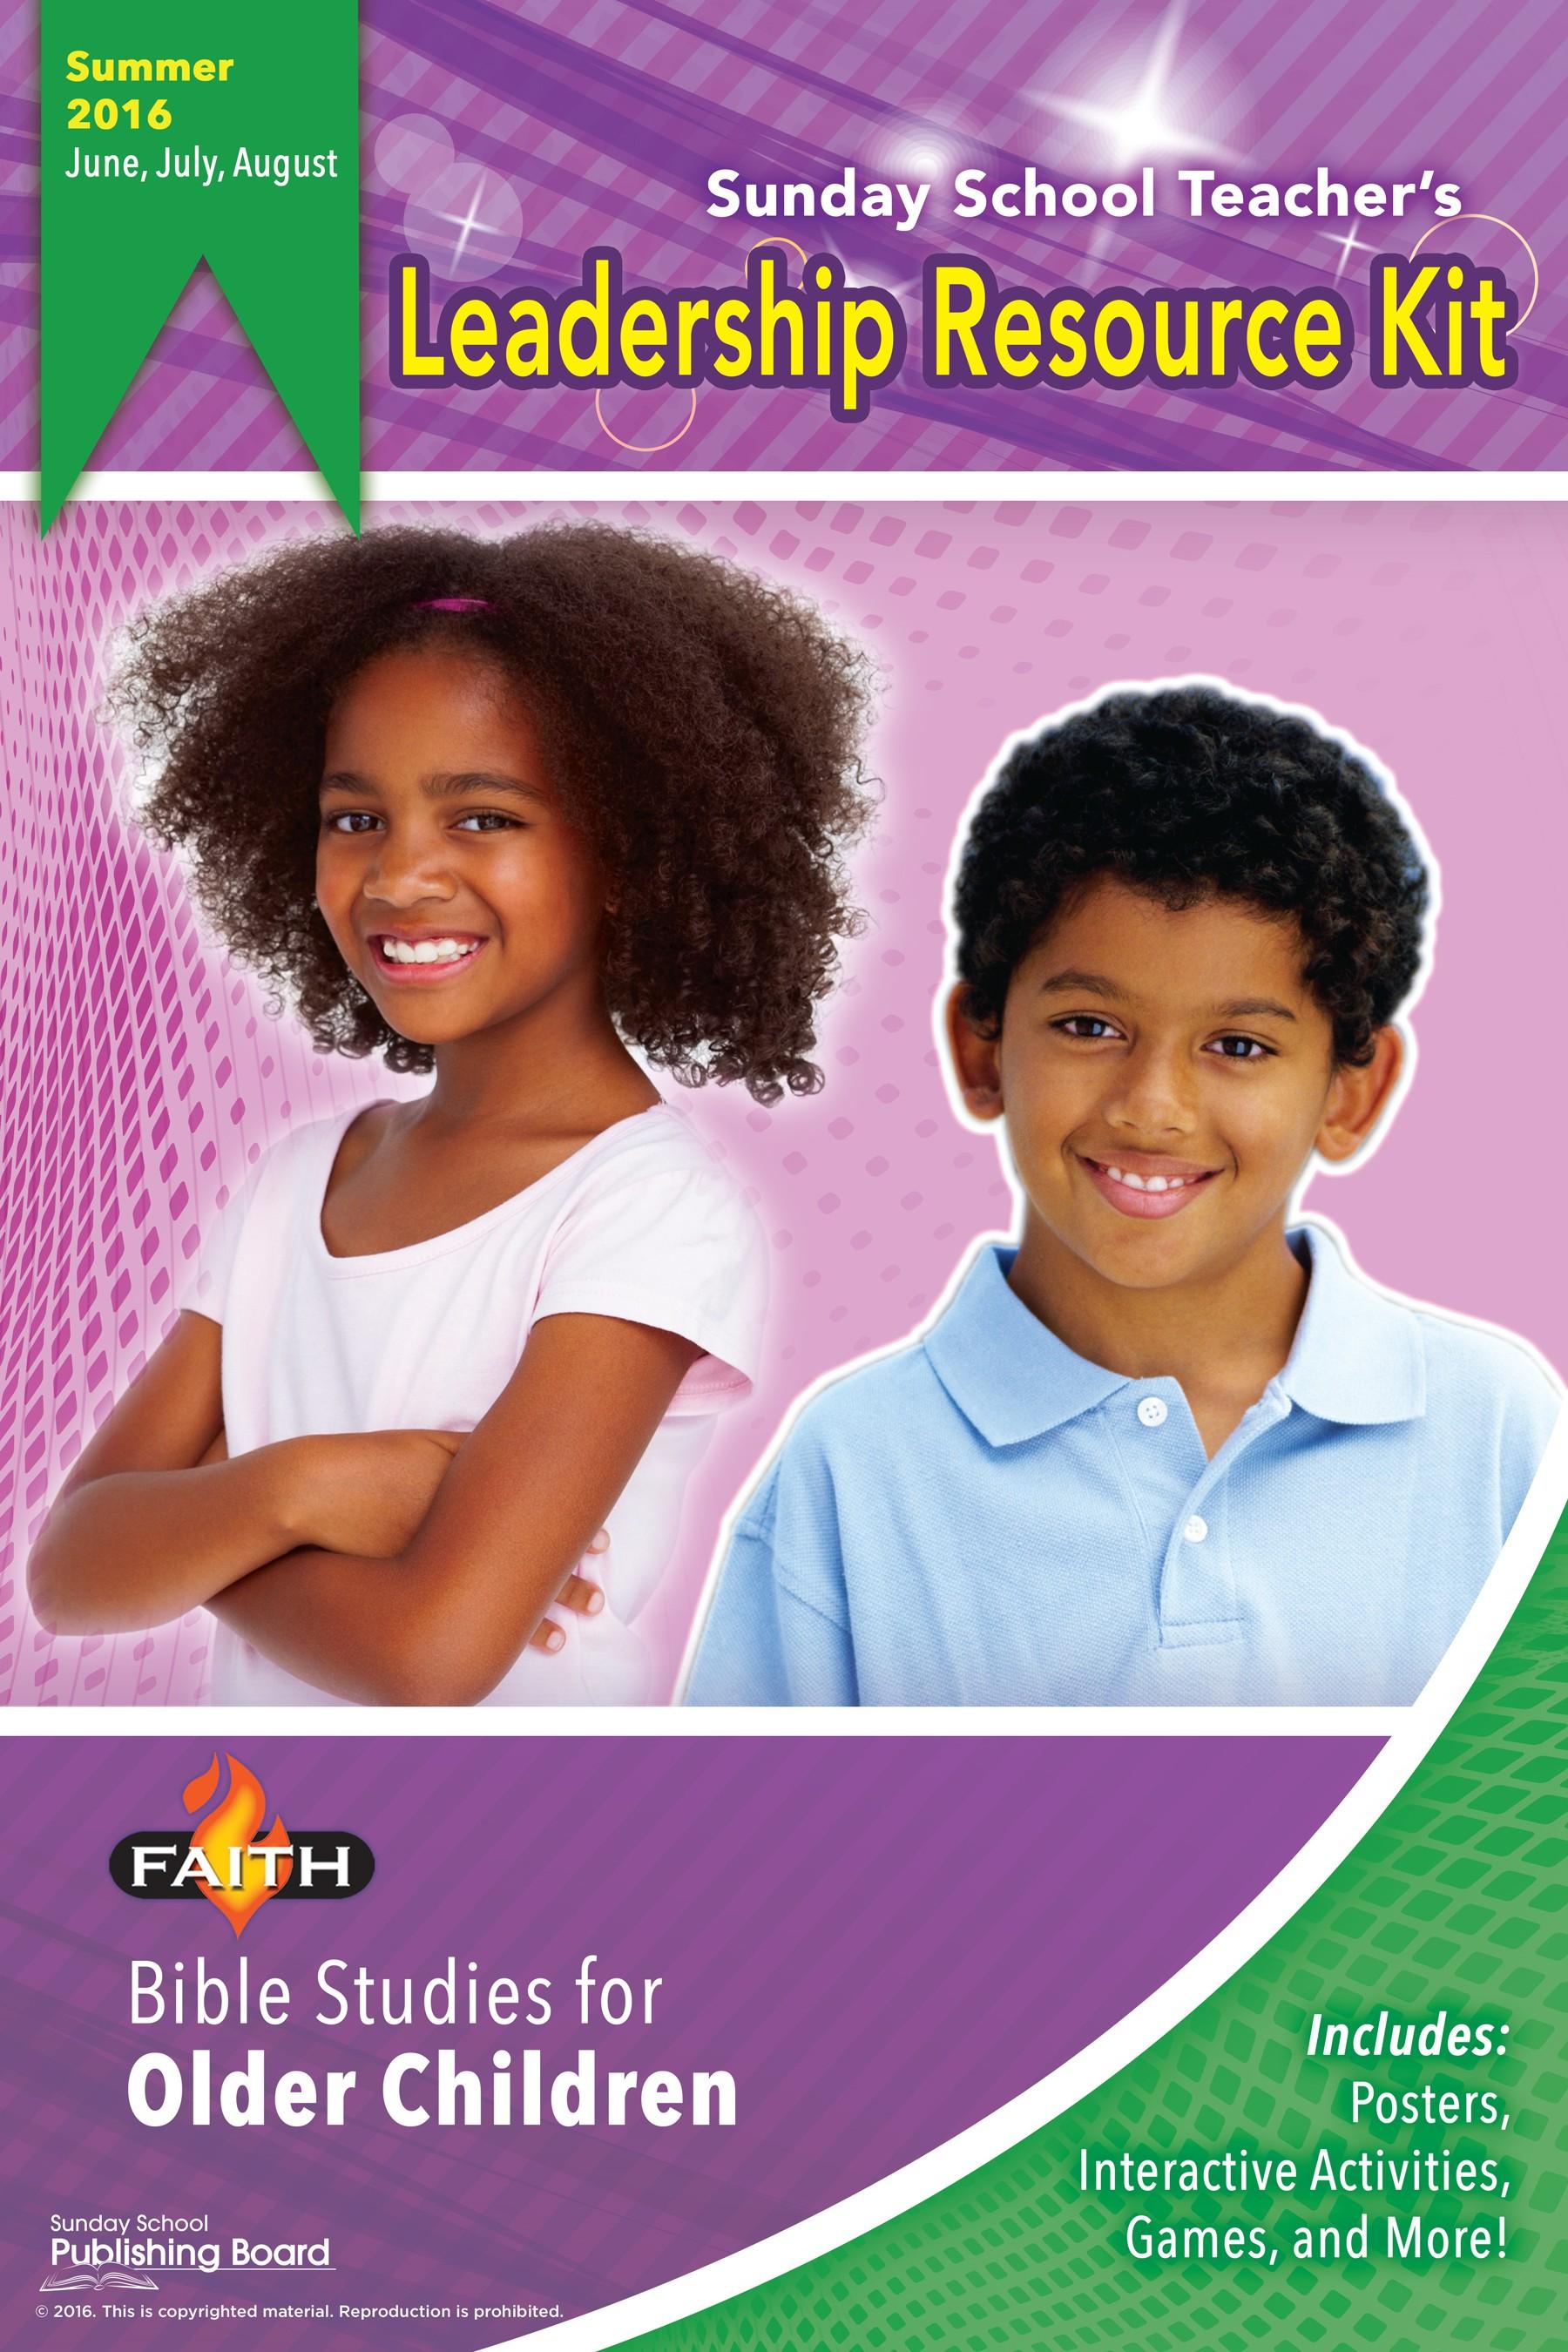 Sunday School Leadership Resource Kit - Older Children